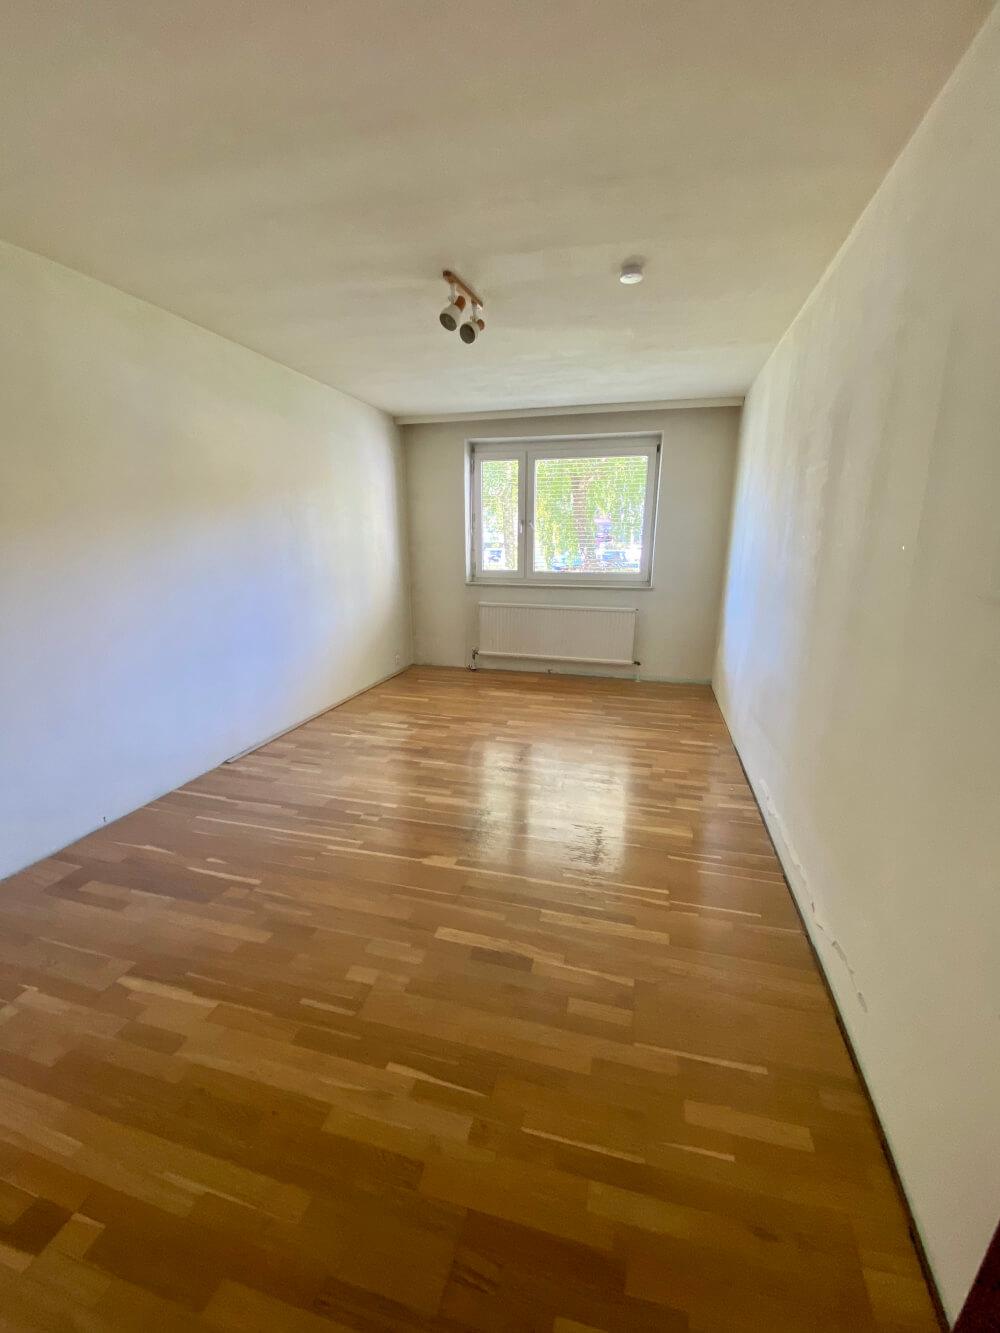 Immobilie von BWSG in Laudongasse 22a/27, 8020 Graz #5